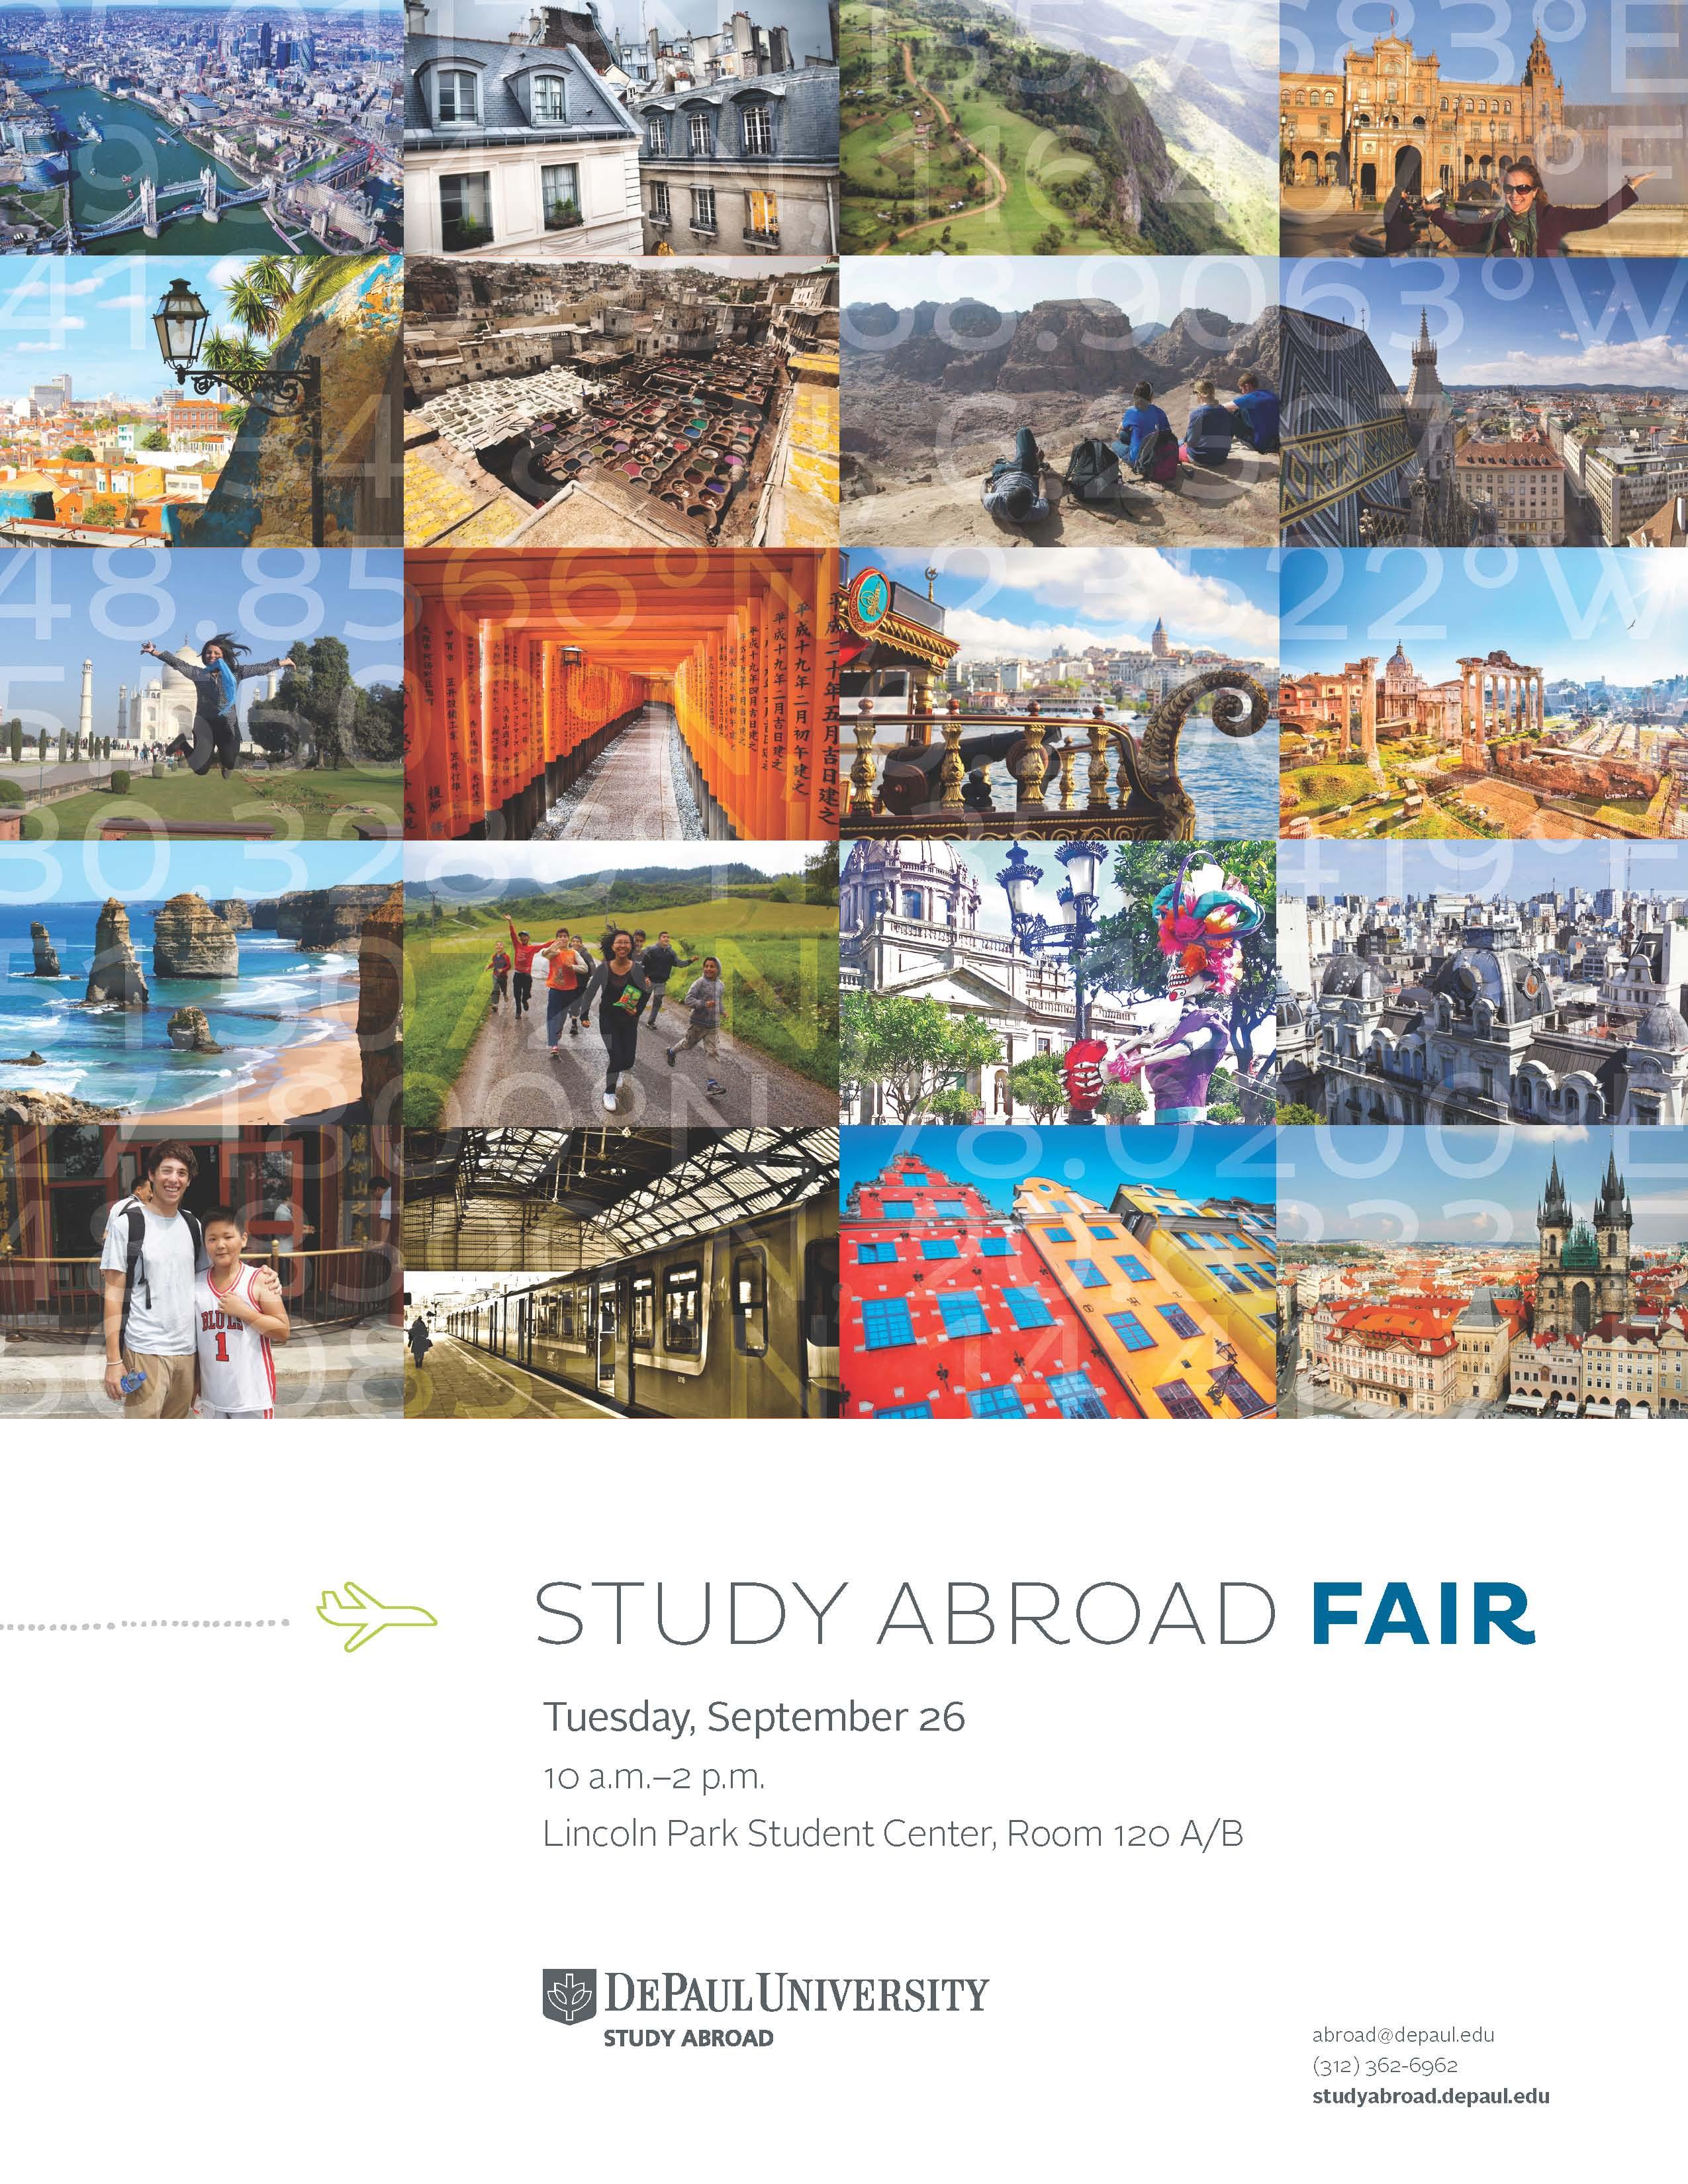 SAP Study Abroad Fair Flyer 0009_17-18